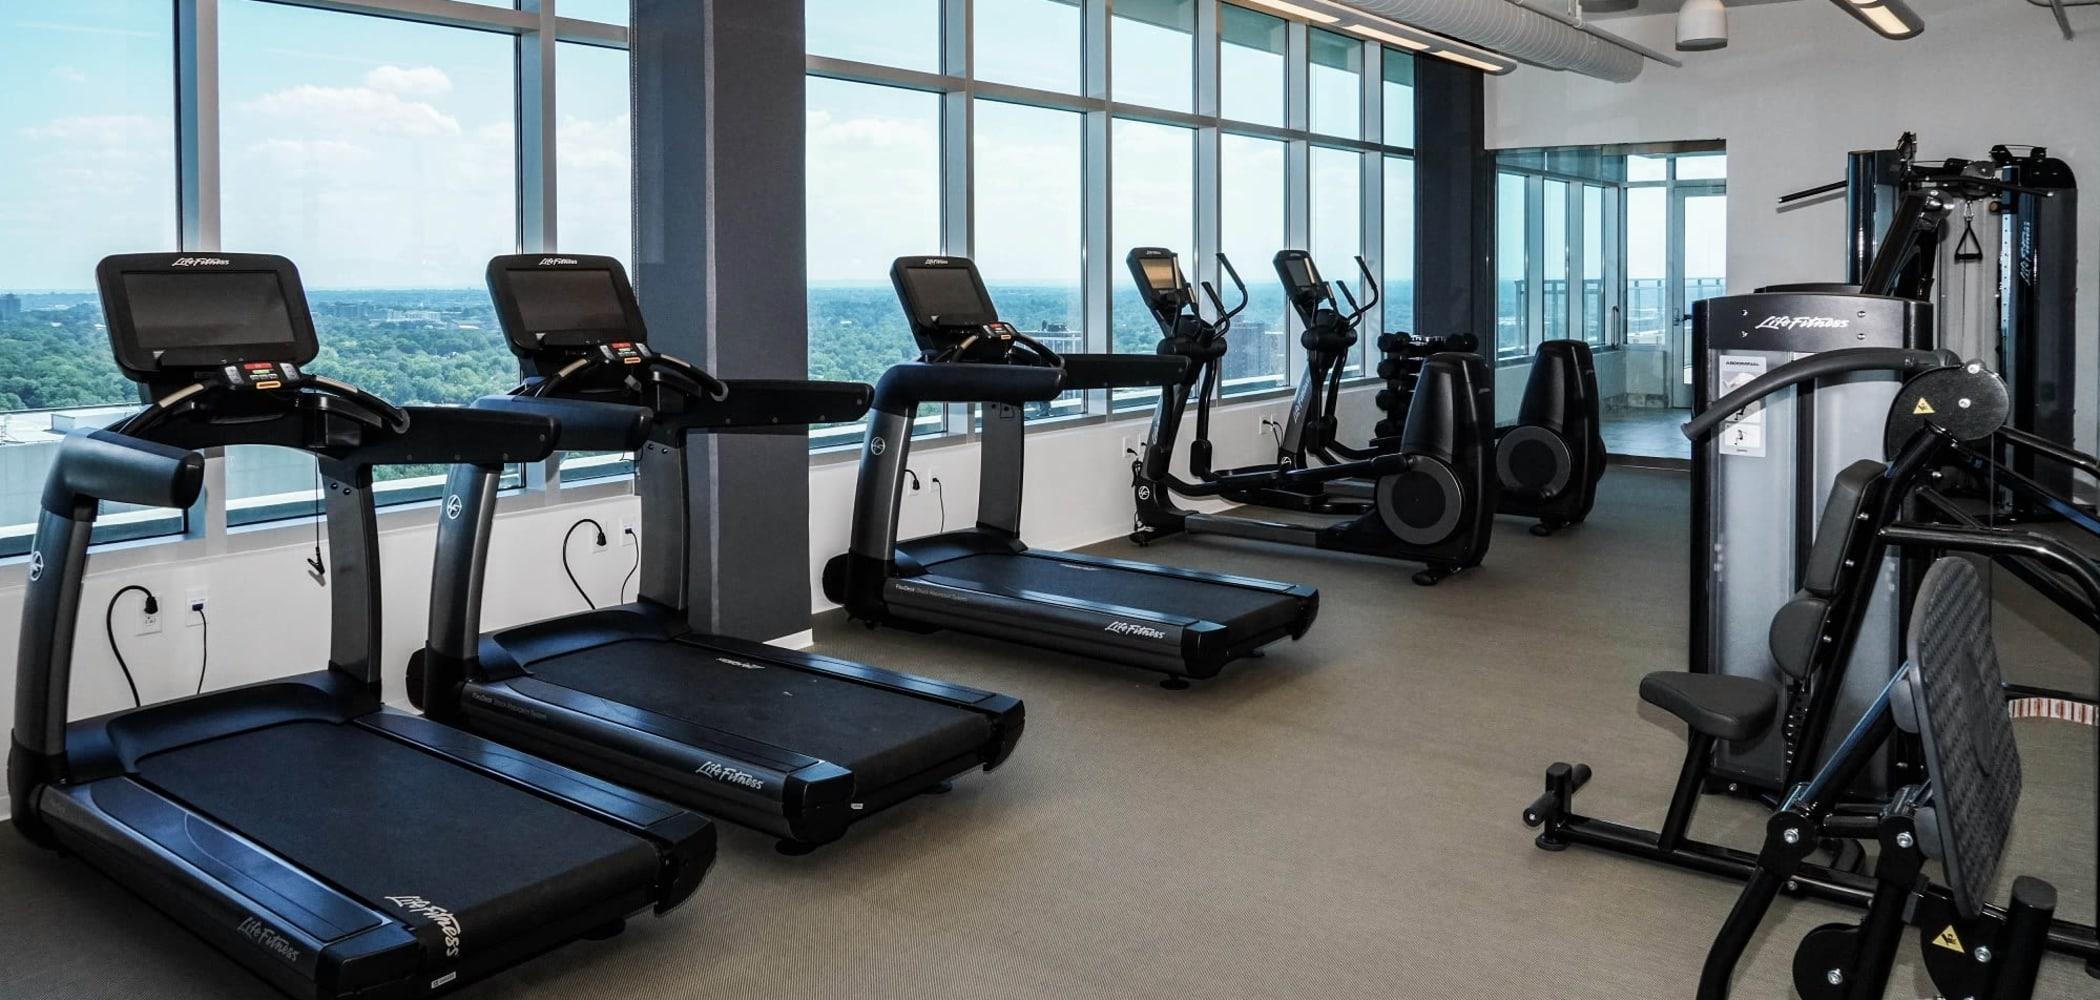 Cardio equipment in Two Twelve Clayton's fitness center in Clayton, Missouri